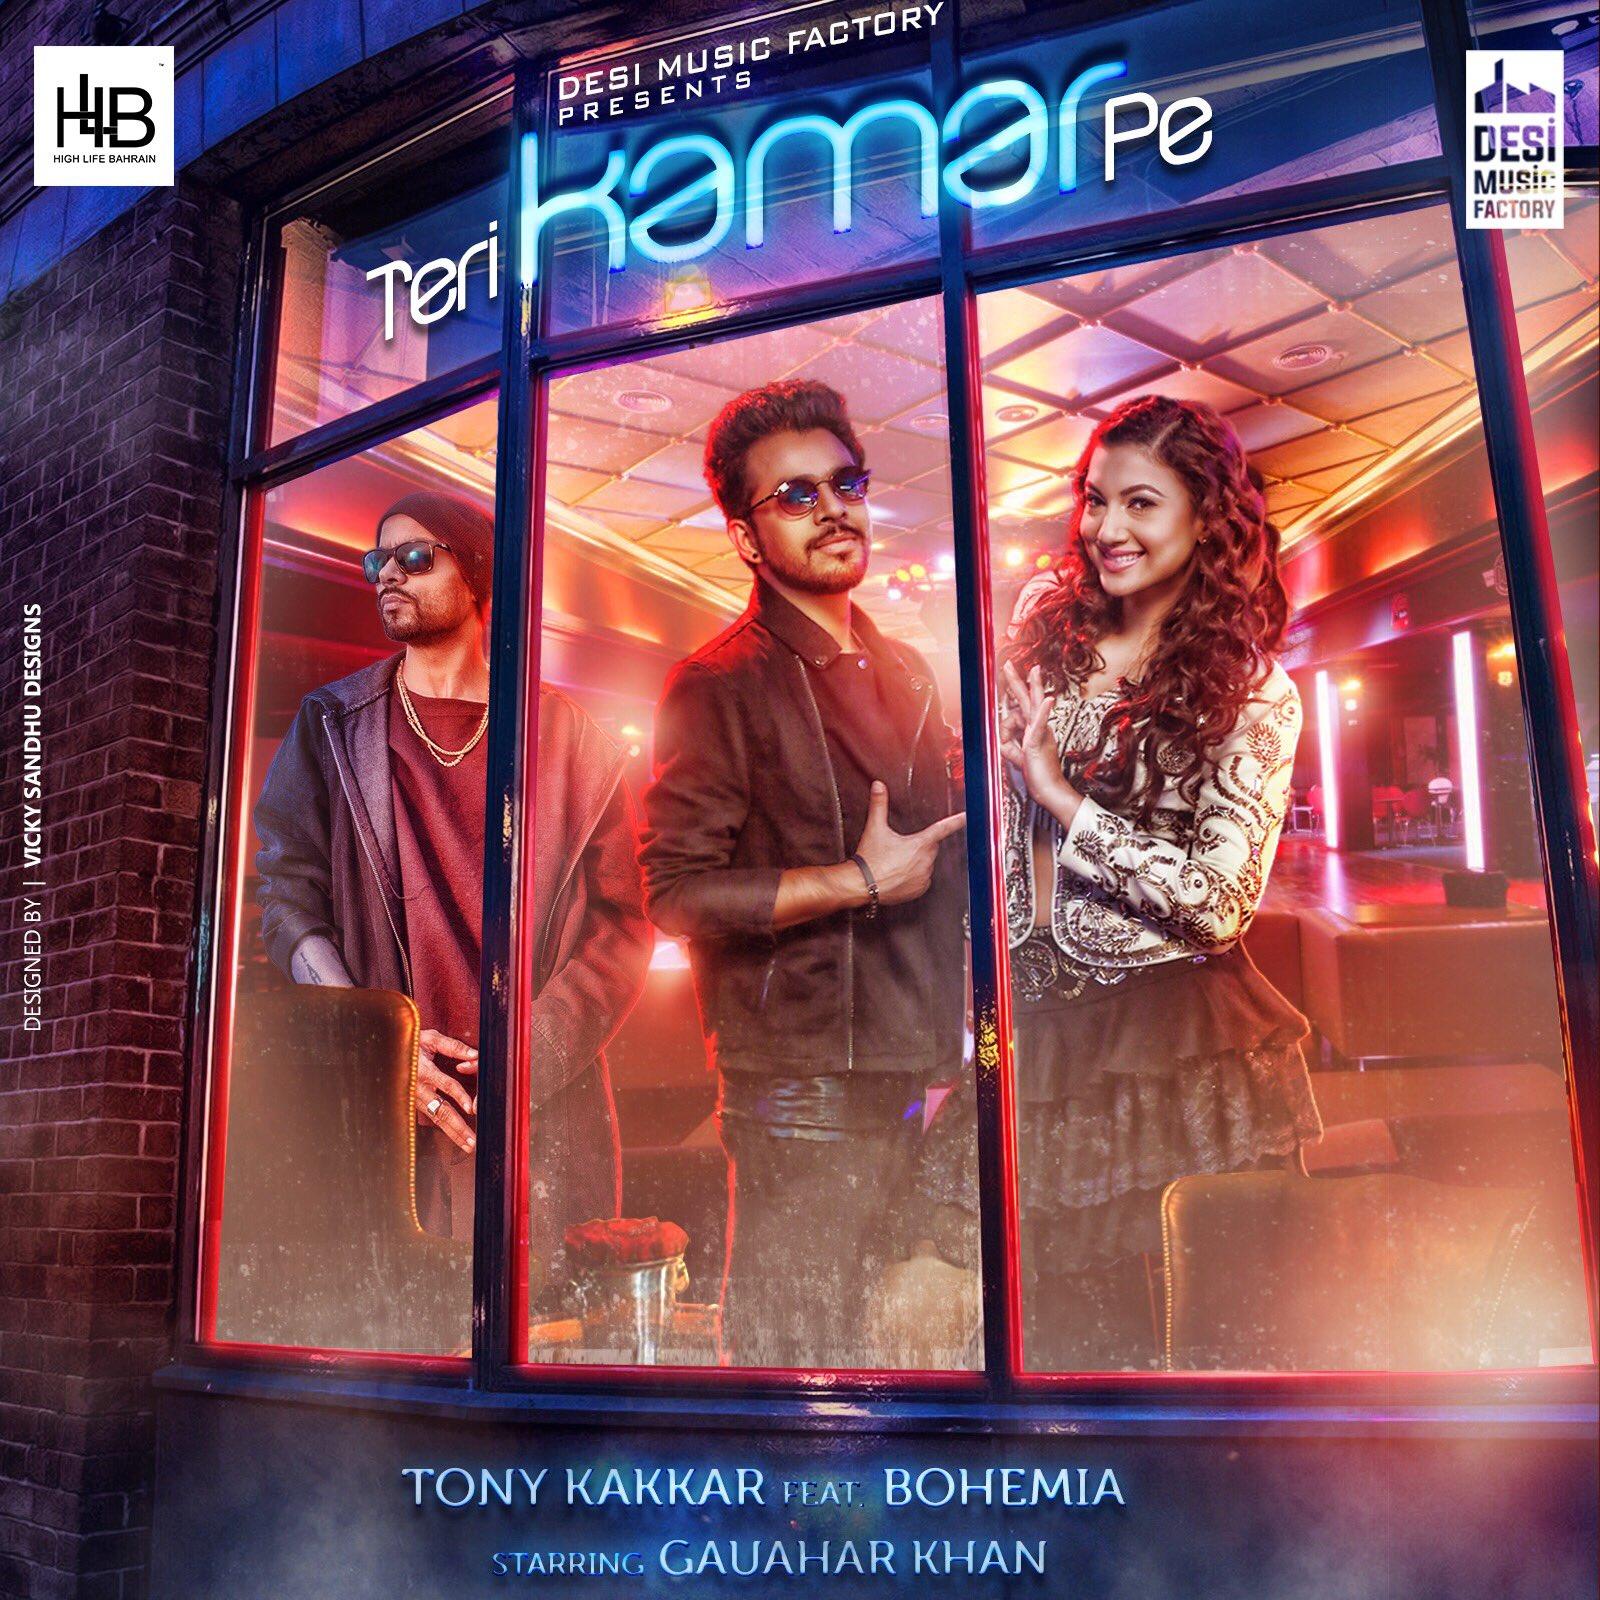 Teri Kamar Pe Is Out On iTunes!